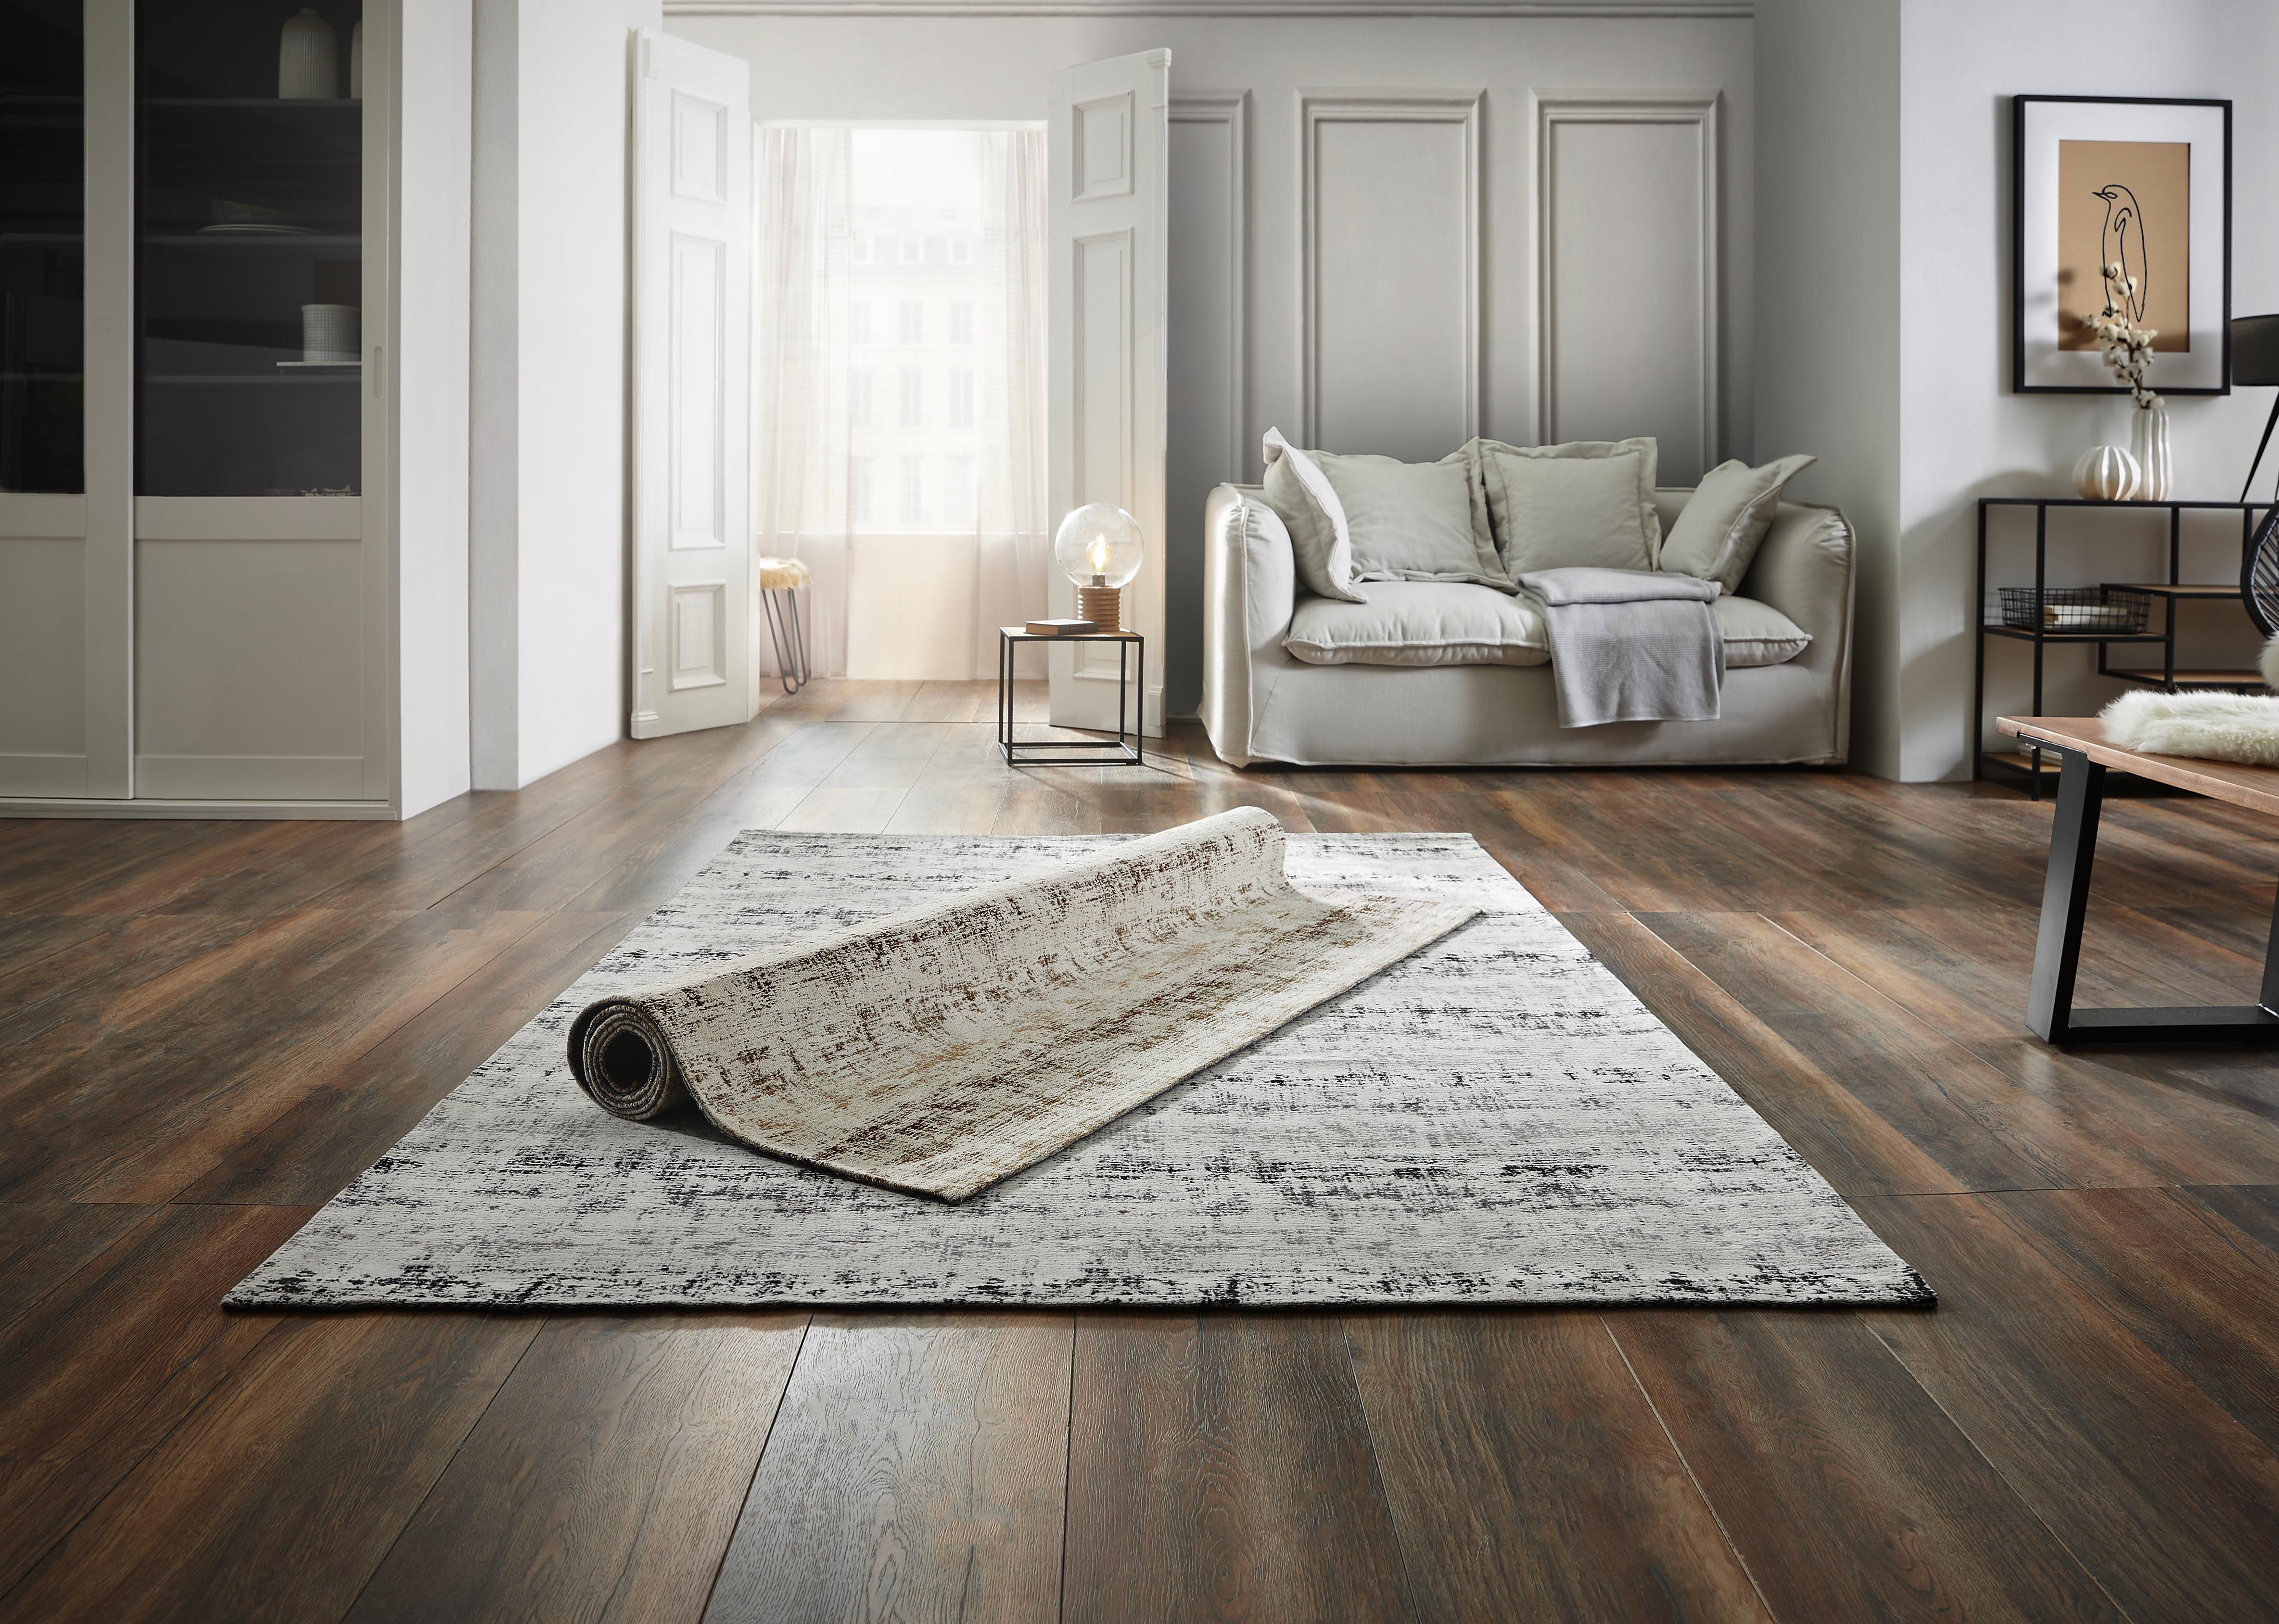 FLATVÄVD MATTA 200/290 cm - beige/brun, Klassisk, textil (200/290cm) - Novel